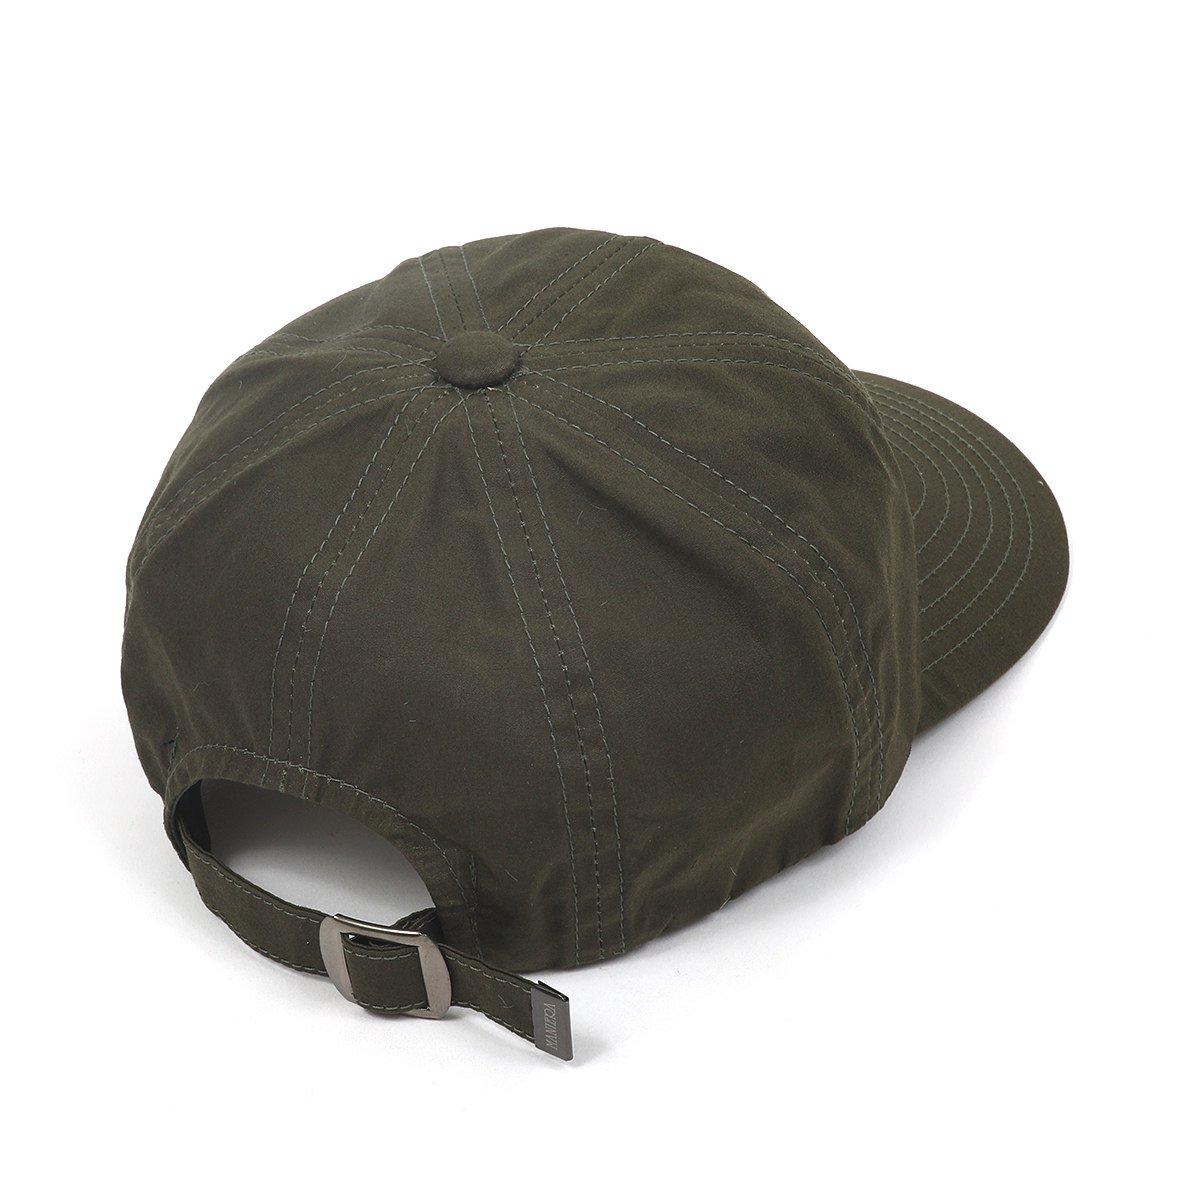 PRAFFIN CAP 詳細画像5